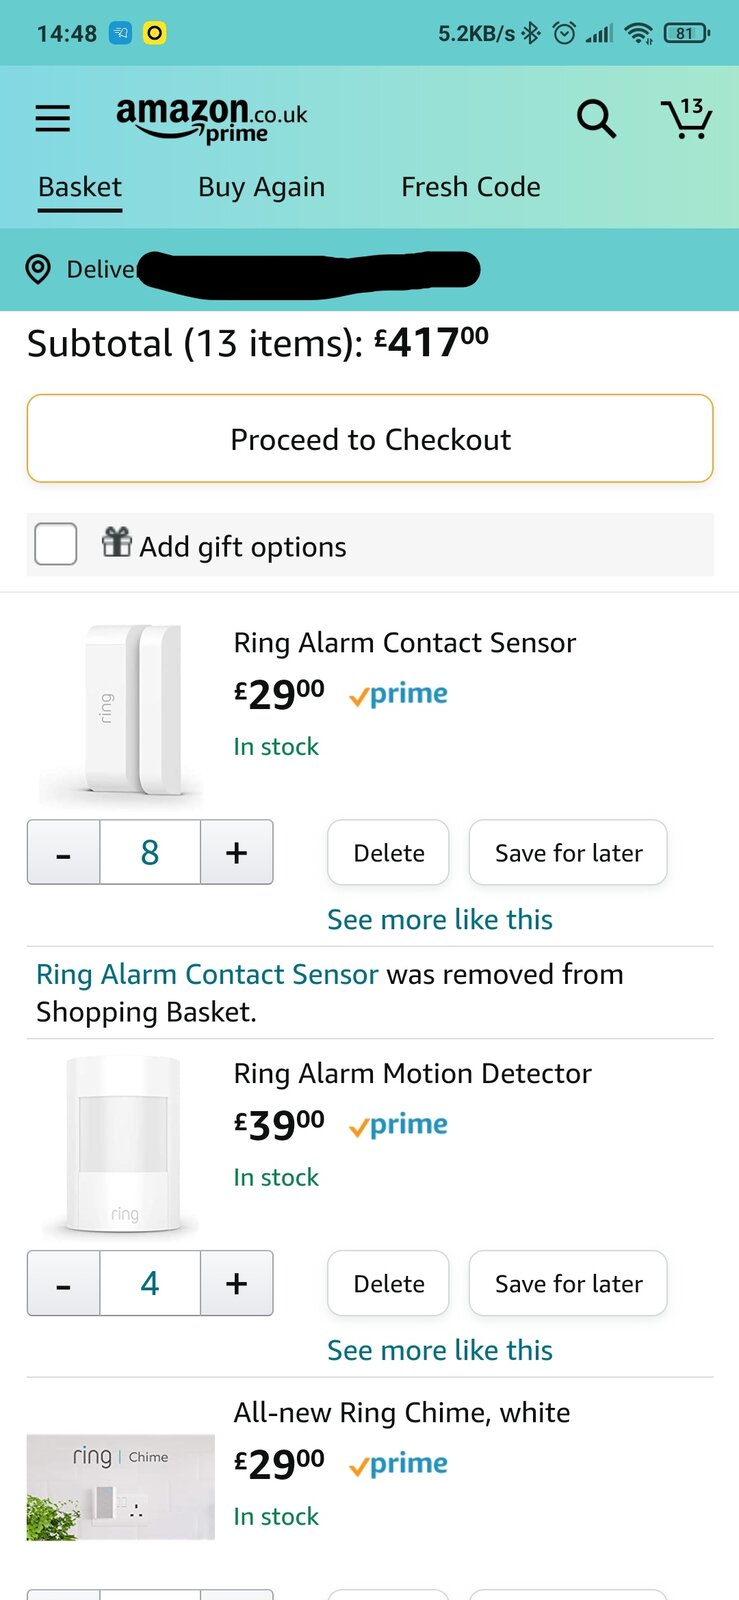 Screenshot_2021-04-07-14-48-22-576_com.amazon.mShop.android.shopping.jpg